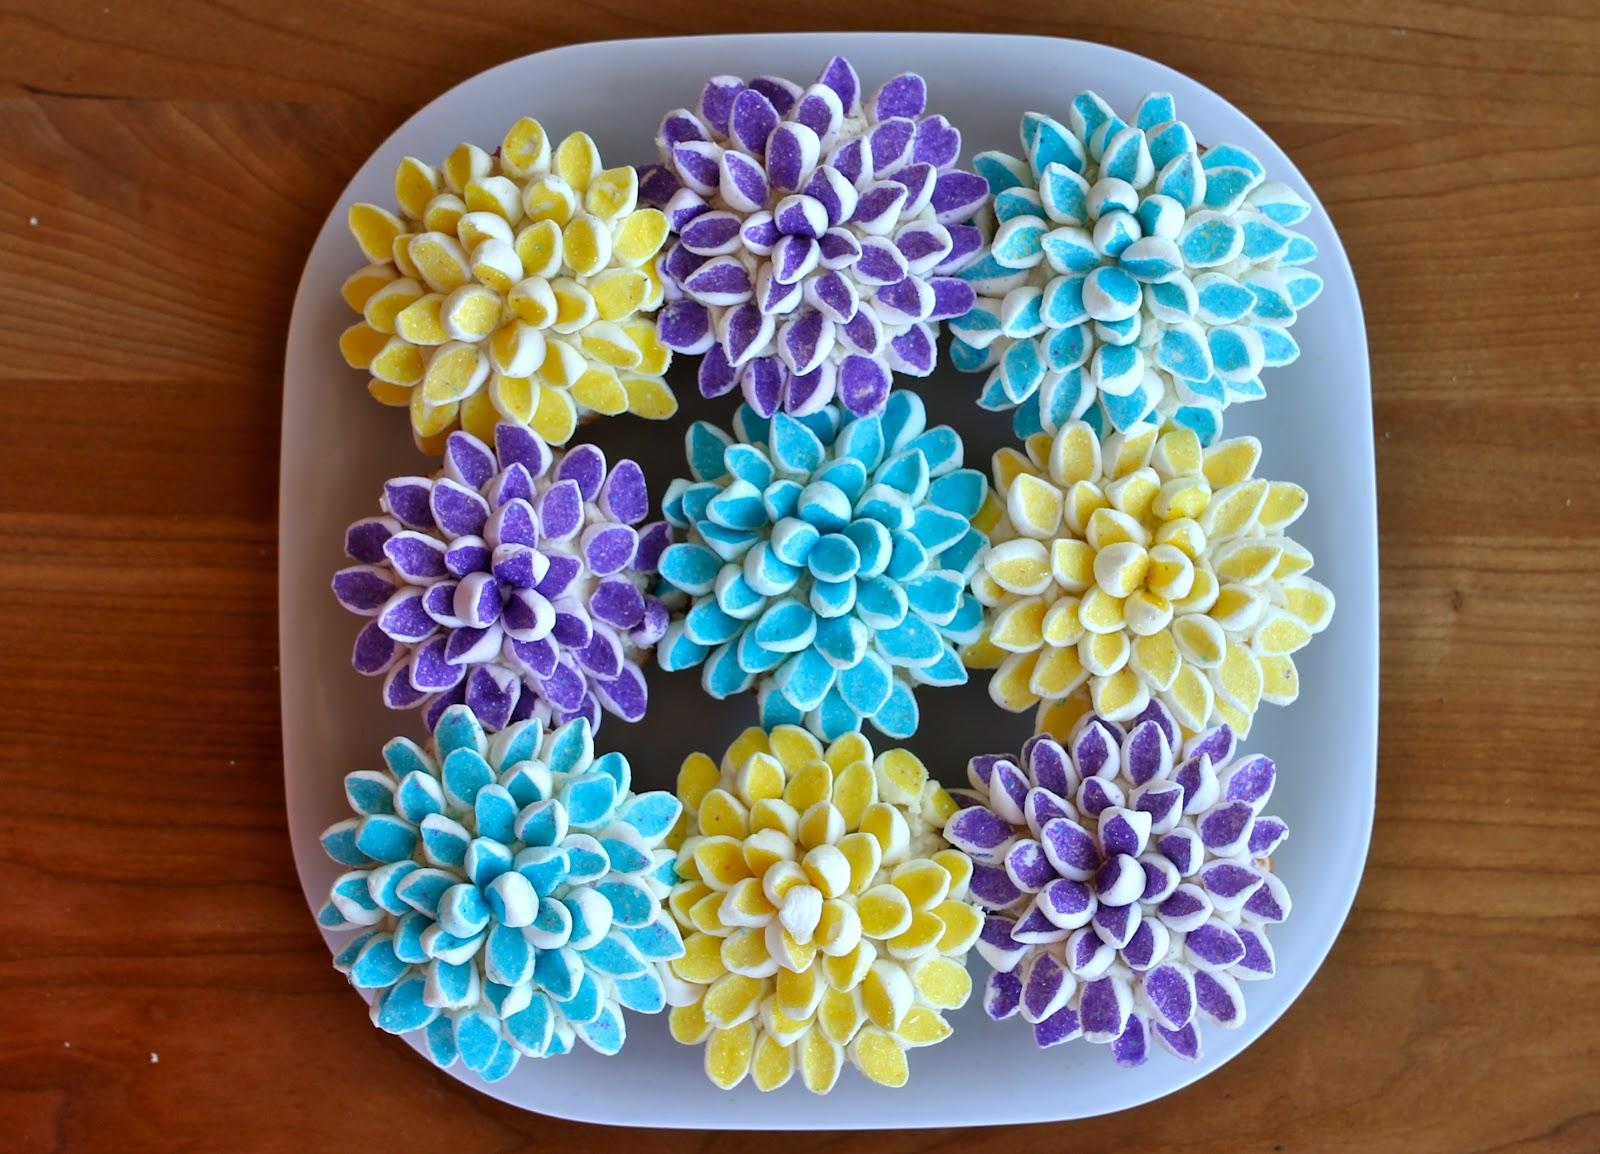 Cake Decorating Marshmallow Flowers : Yammie s Noshery: Marshmallow Flower Cupcakes